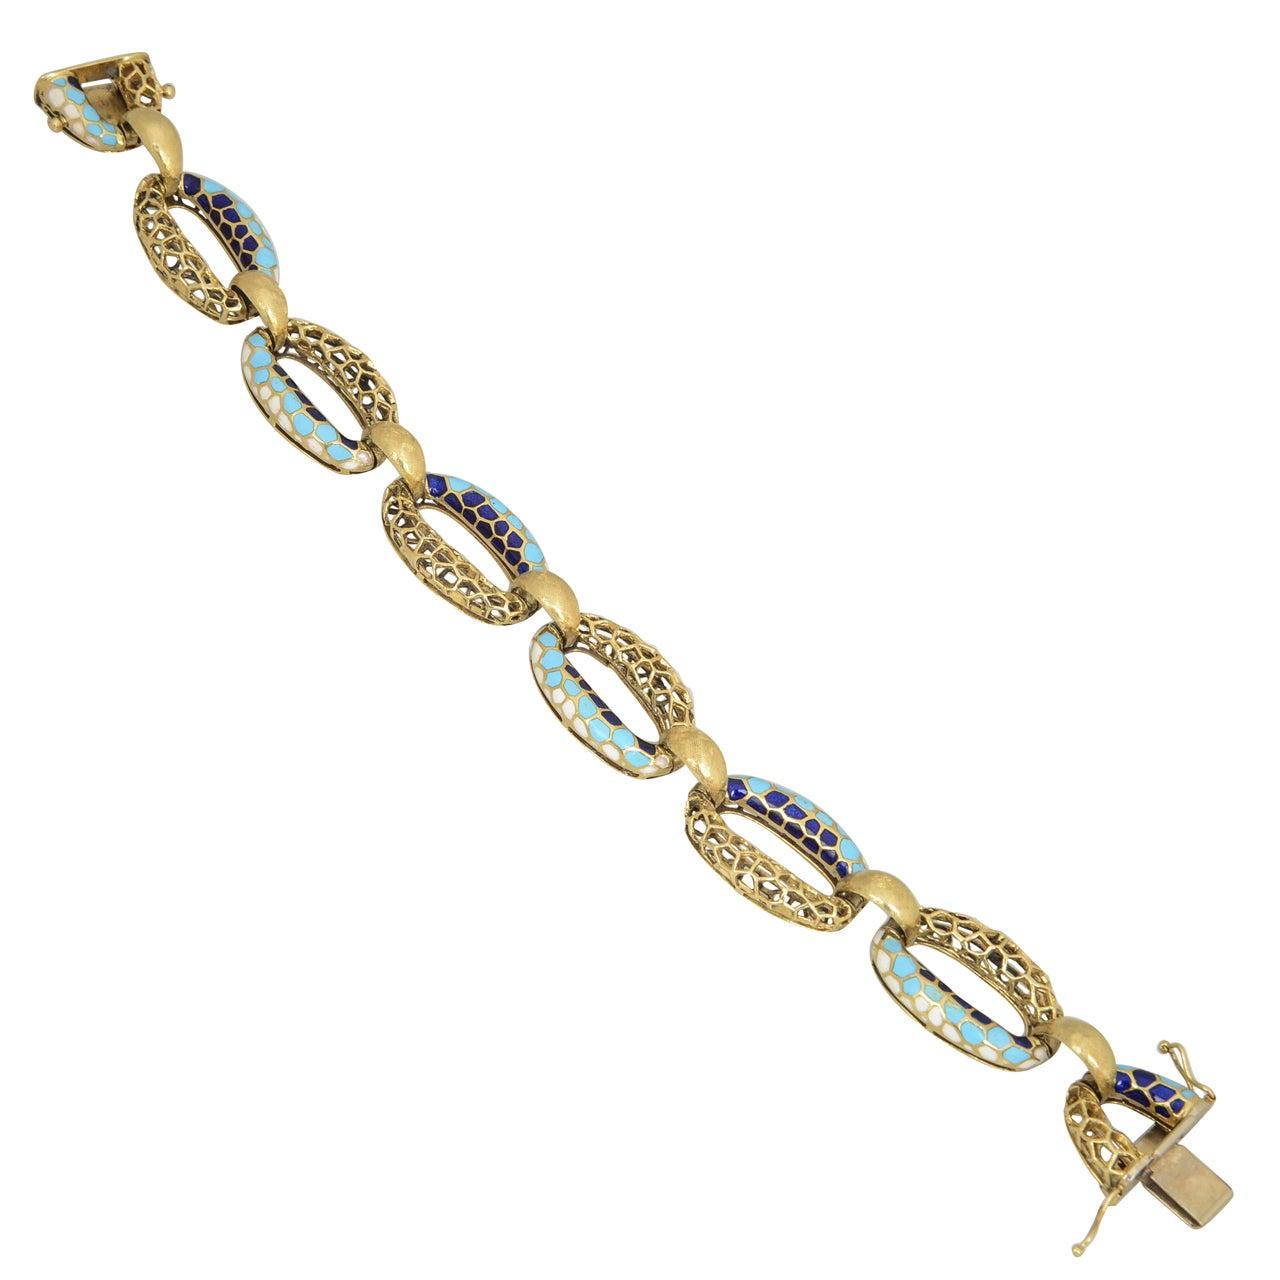 1970s Blue and White Enamel Honeycomb Gold Bracelet